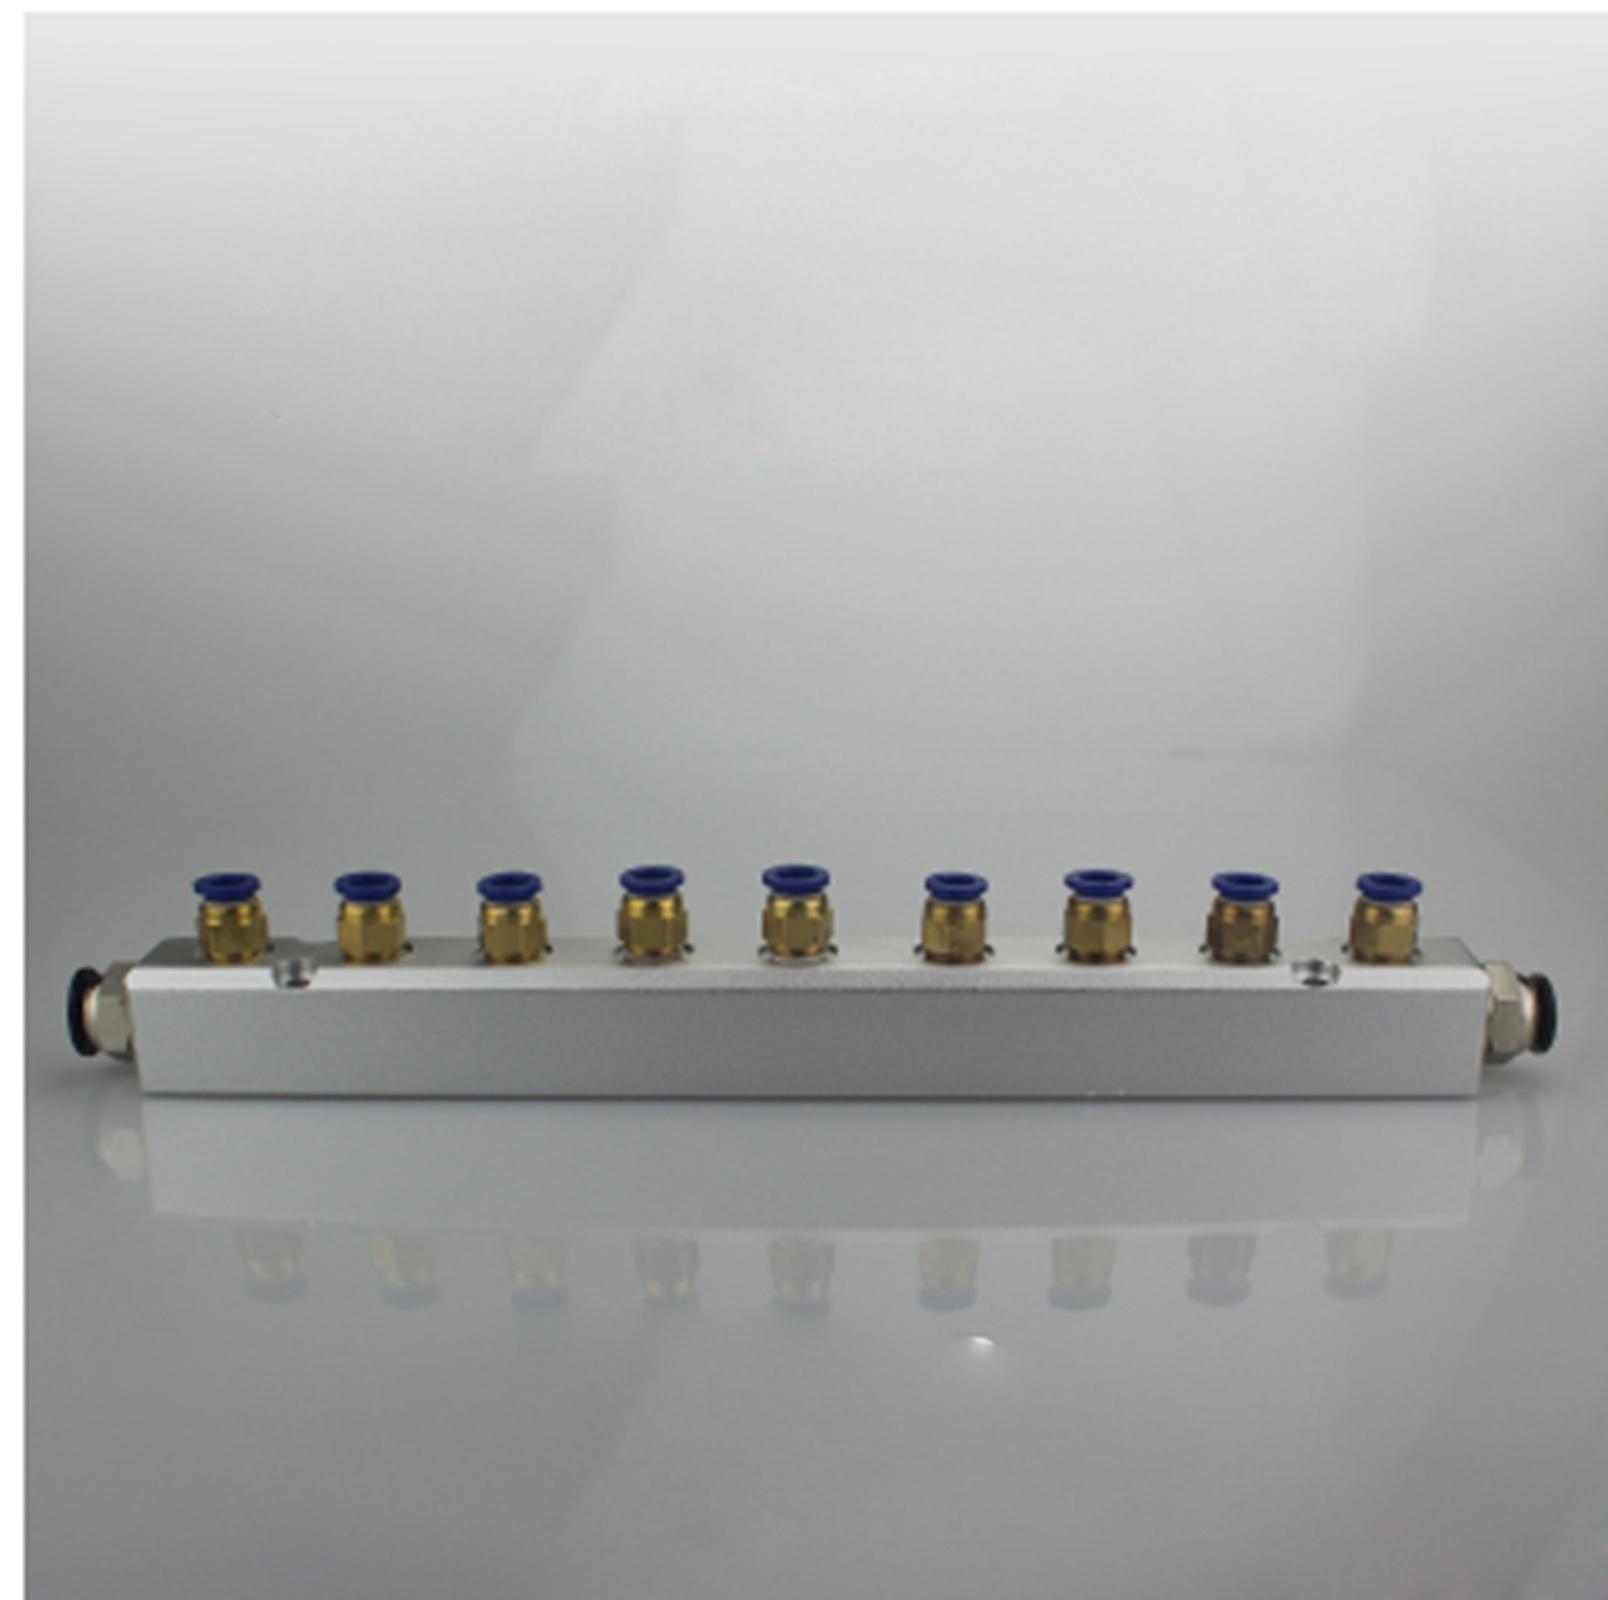 A Kit 30x30mm 9 Way Pneumatic Air Manifold Splitter With Push Fit CouplerA Kit 30x30mm 9 Way Pneumatic Air Manifold Splitter With Push Fit Coupler